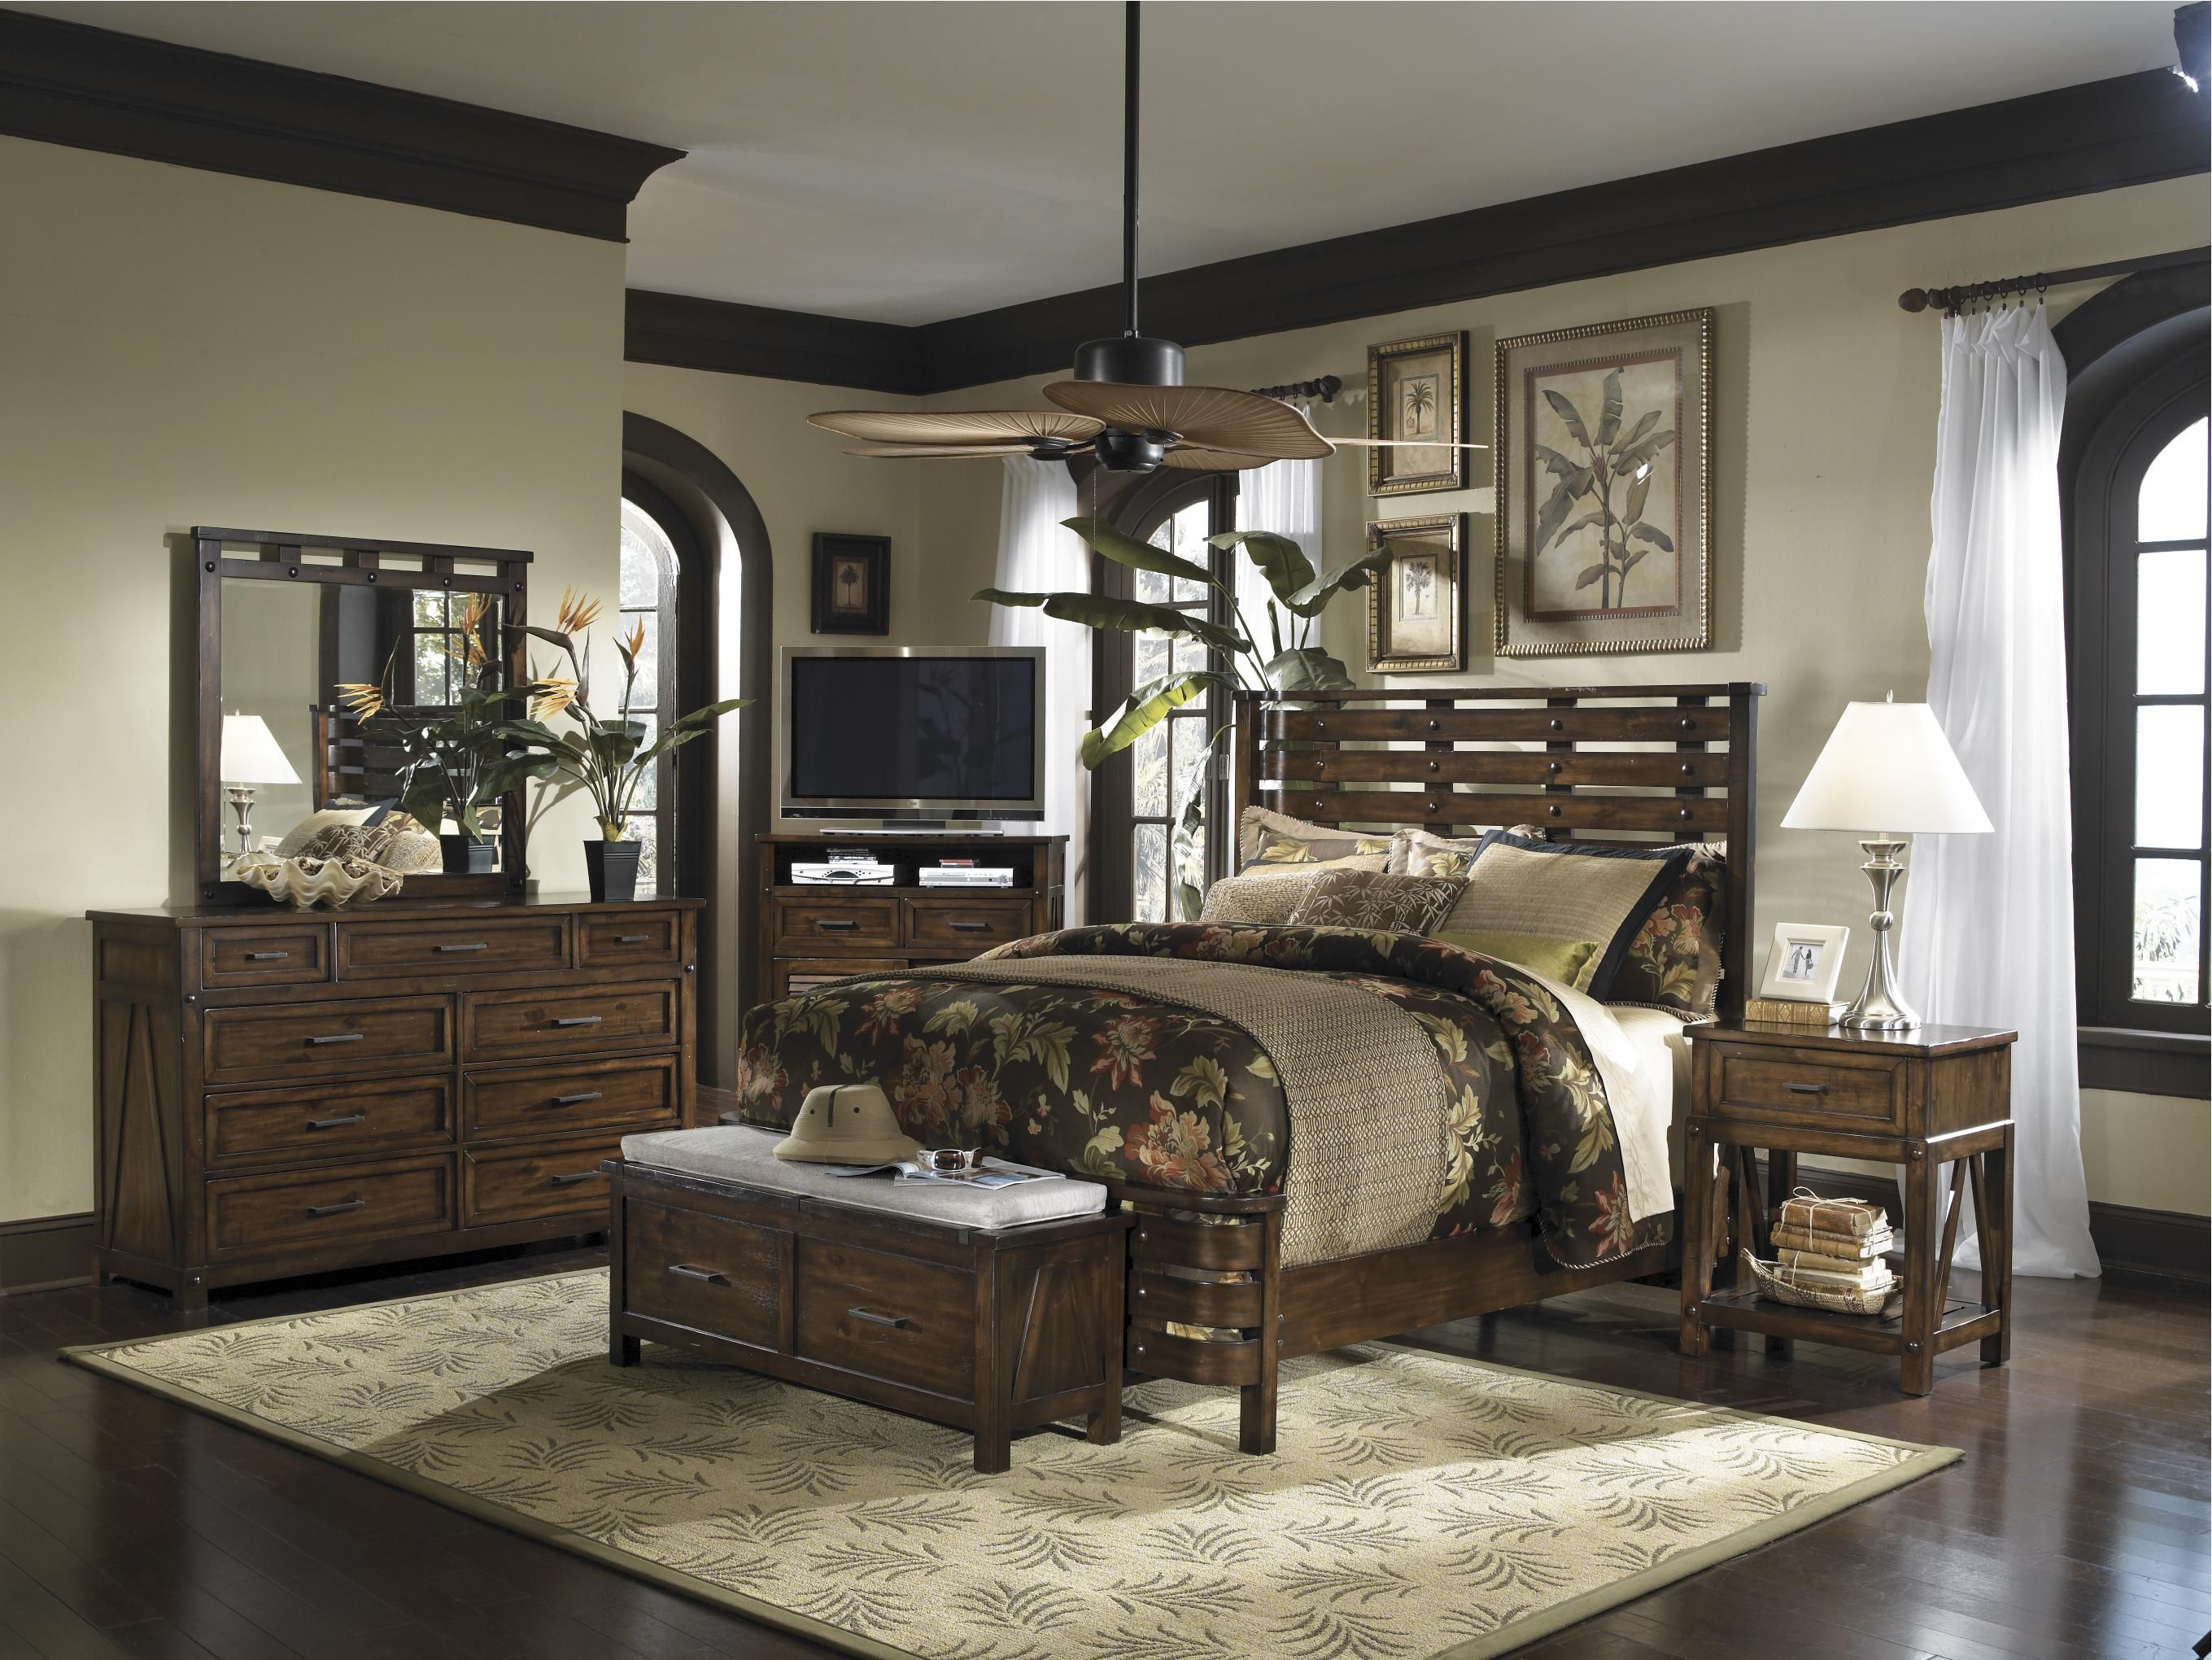 Panama Jack Eco Jack Alternate Bed Frame Home 5 Piece